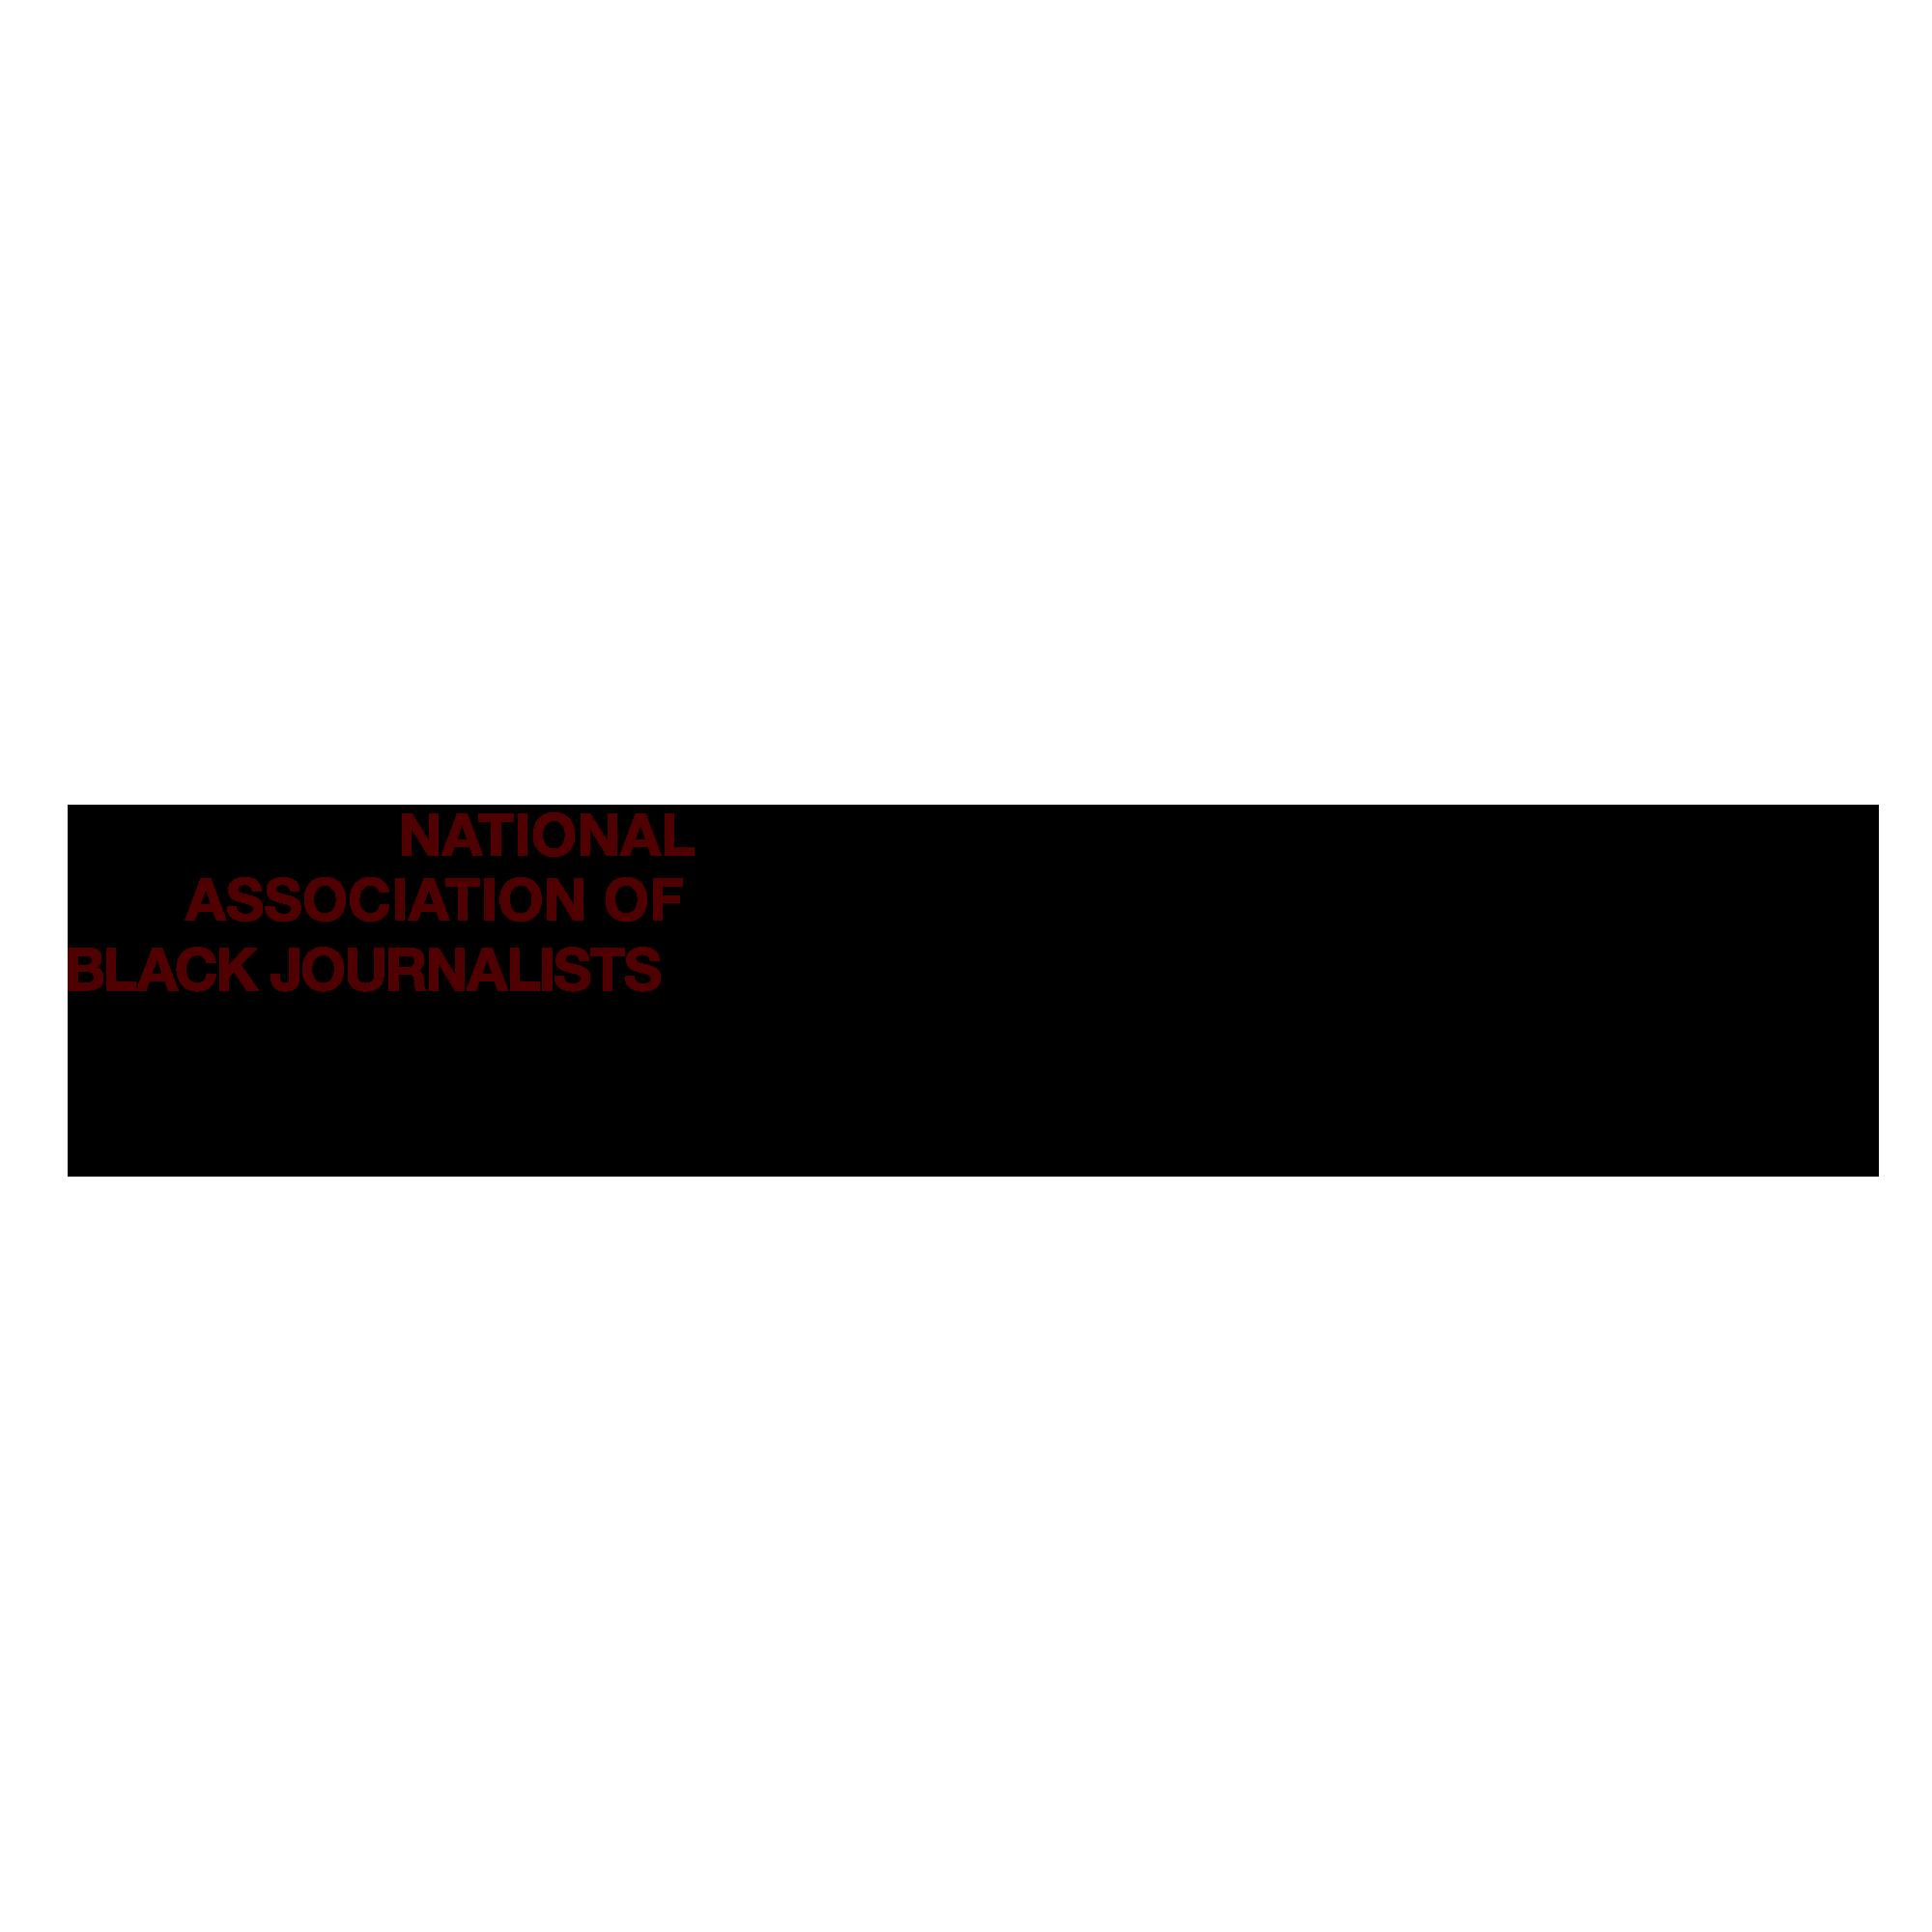 National Association of Black Journalists logo